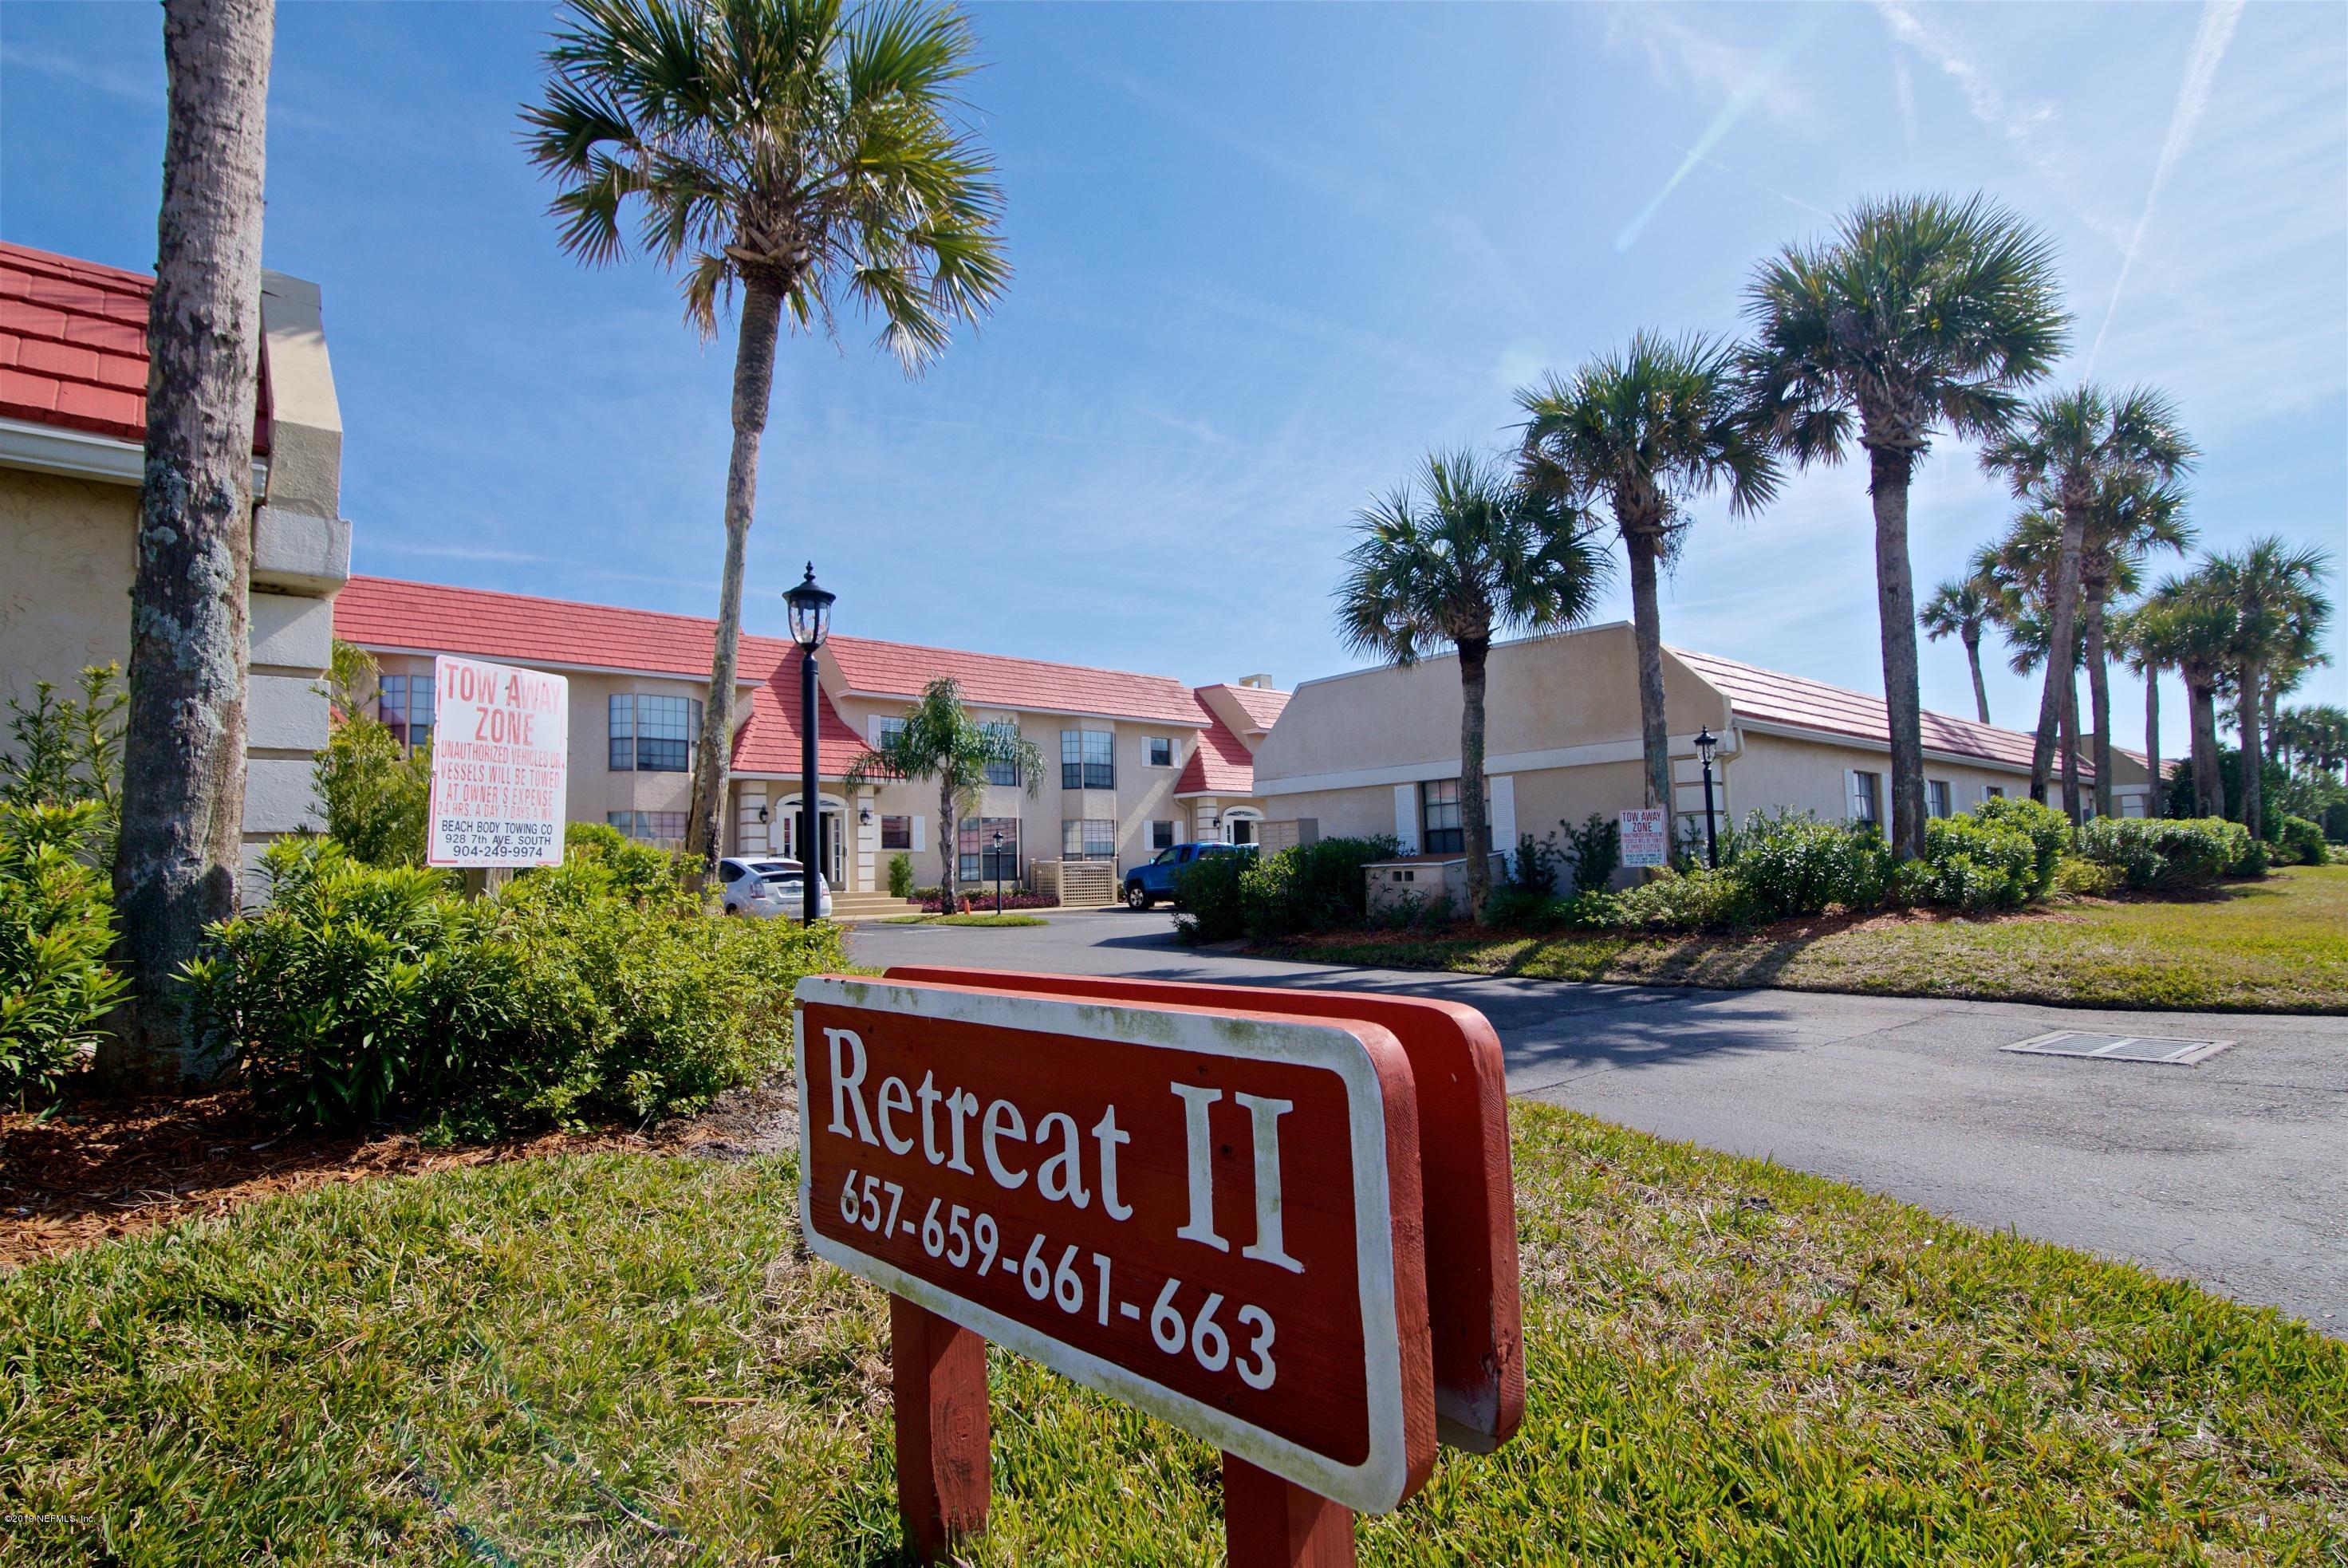 661 PONTE VEDRA, PONTE VEDRA BEACH, FLORIDA 32082, 2 Bedrooms Bedrooms, ,2 BathroomsBathrooms,Residential - condos/townhomes,For sale,PONTE VEDRA,983181